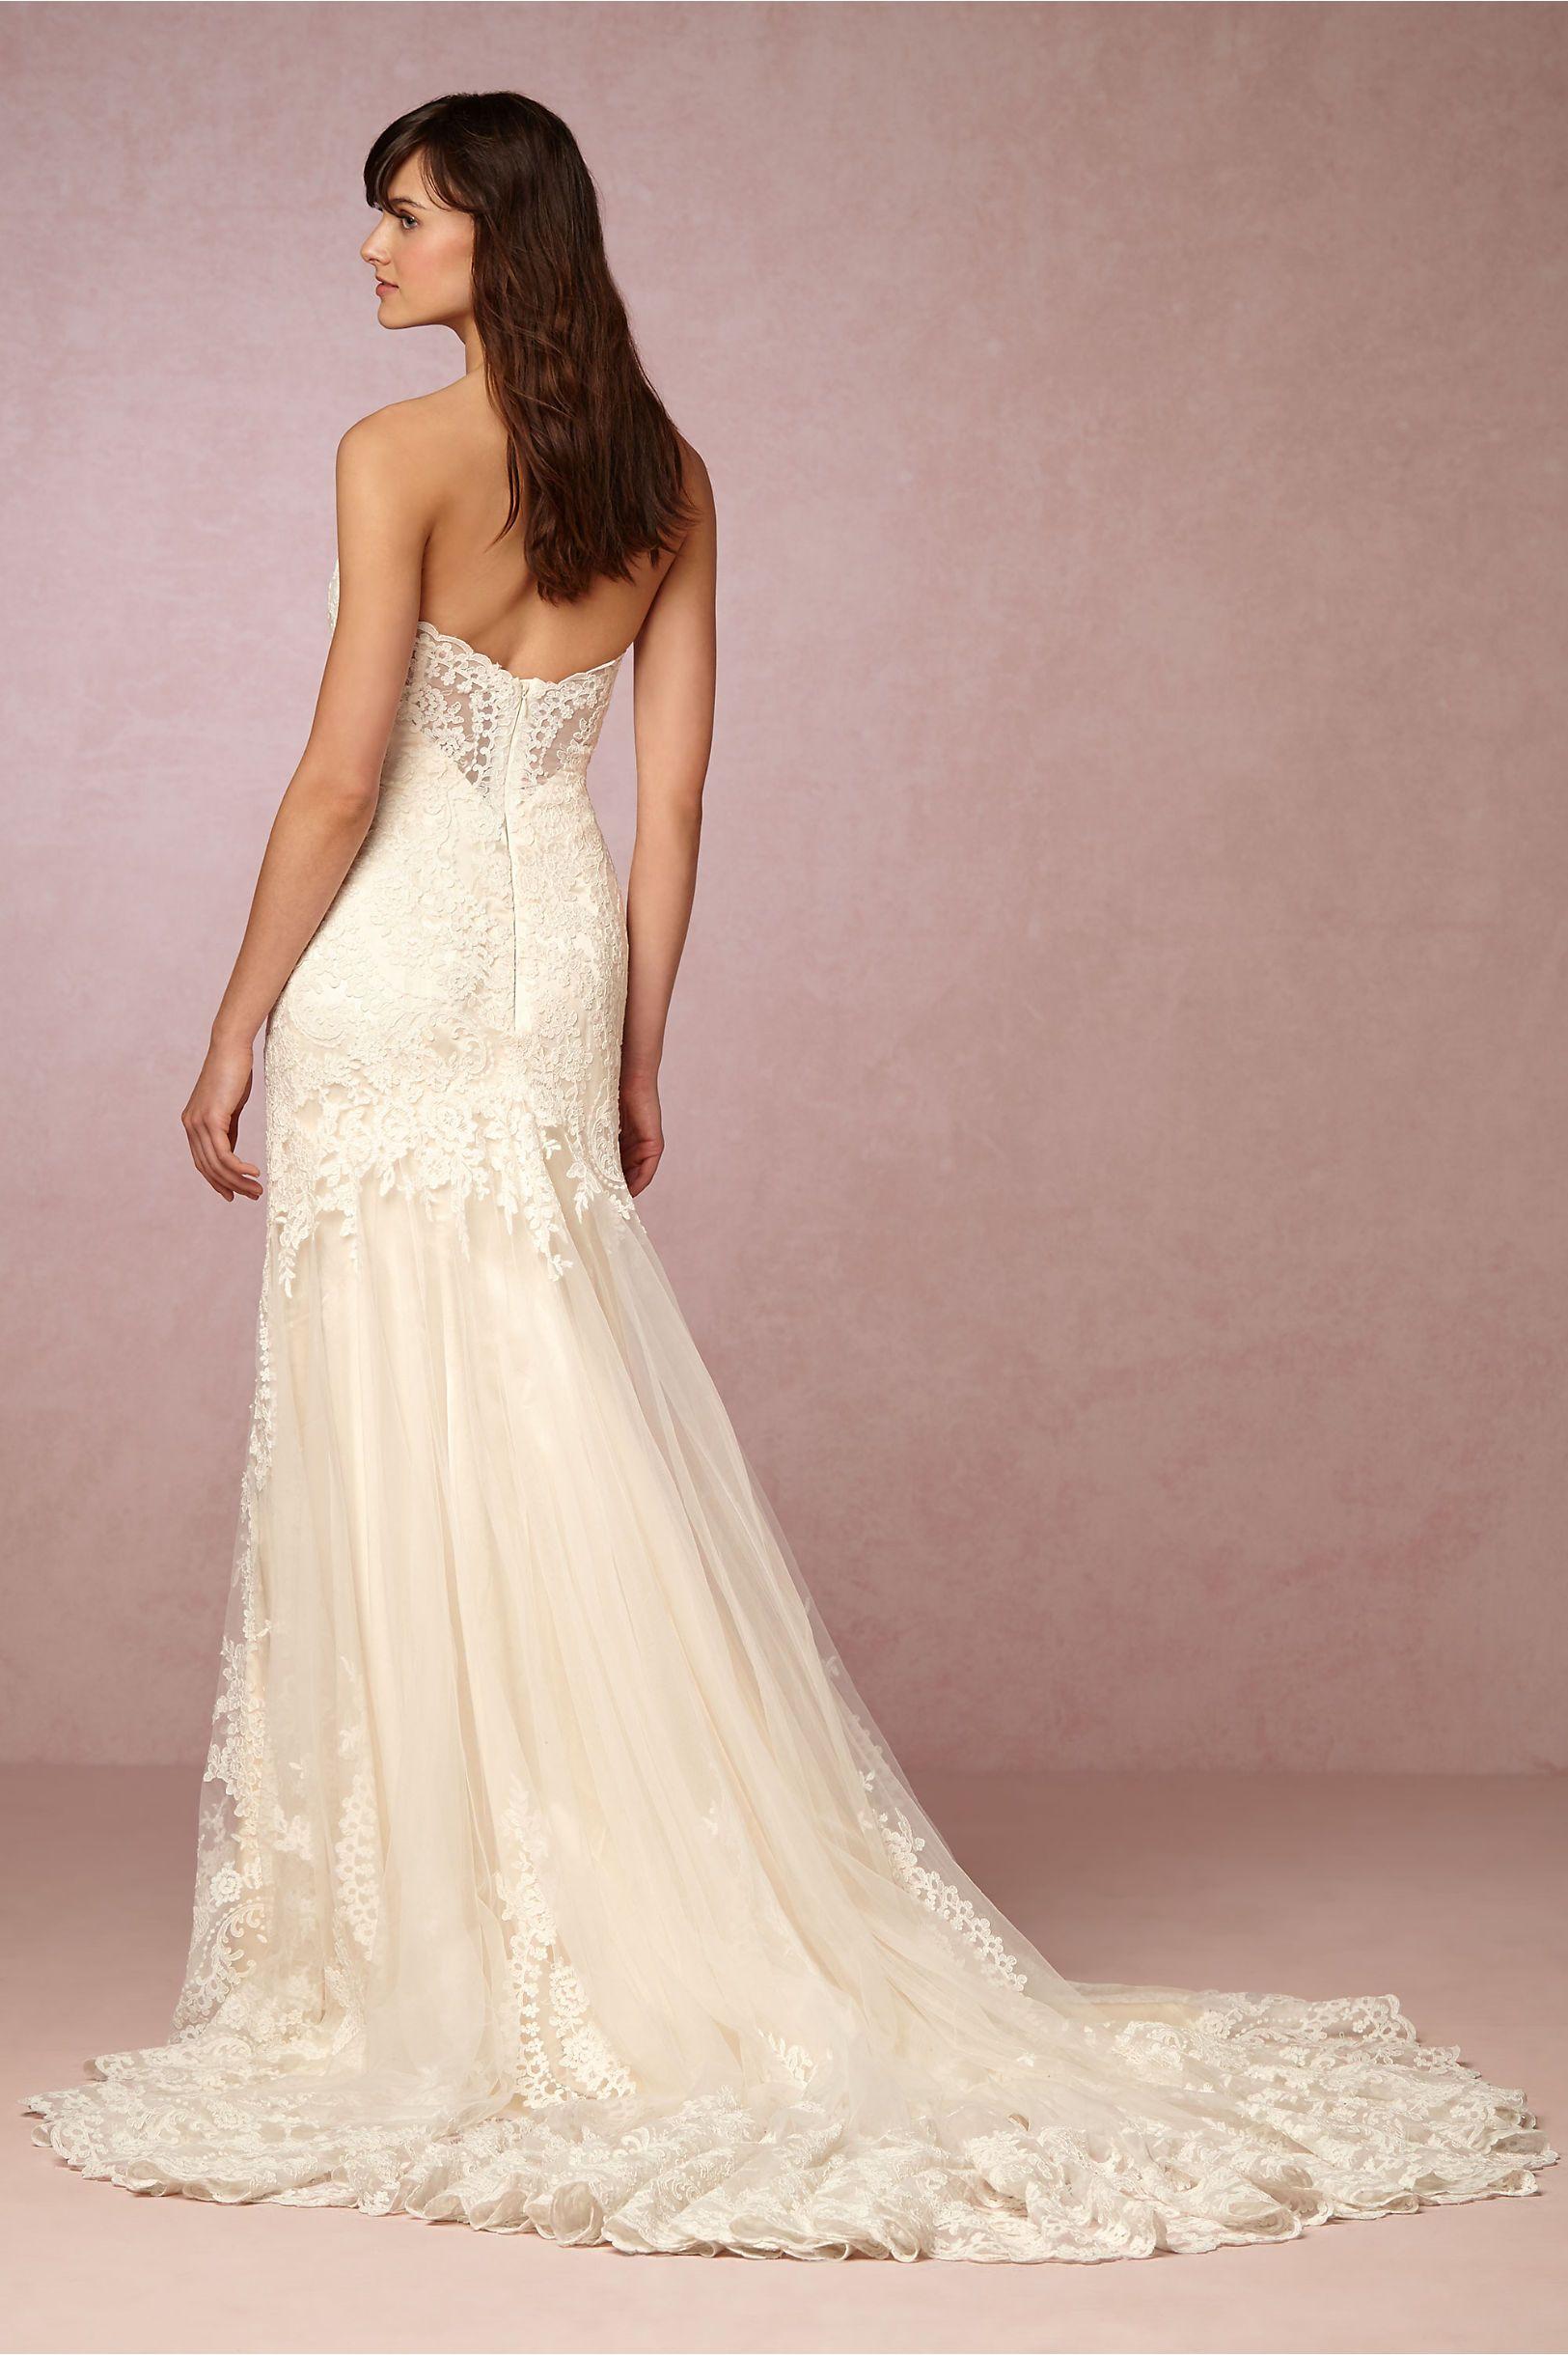 BHLDN Leigh Gown in Bride Wedding Dresses at BHLDN | Wedding ideas ...